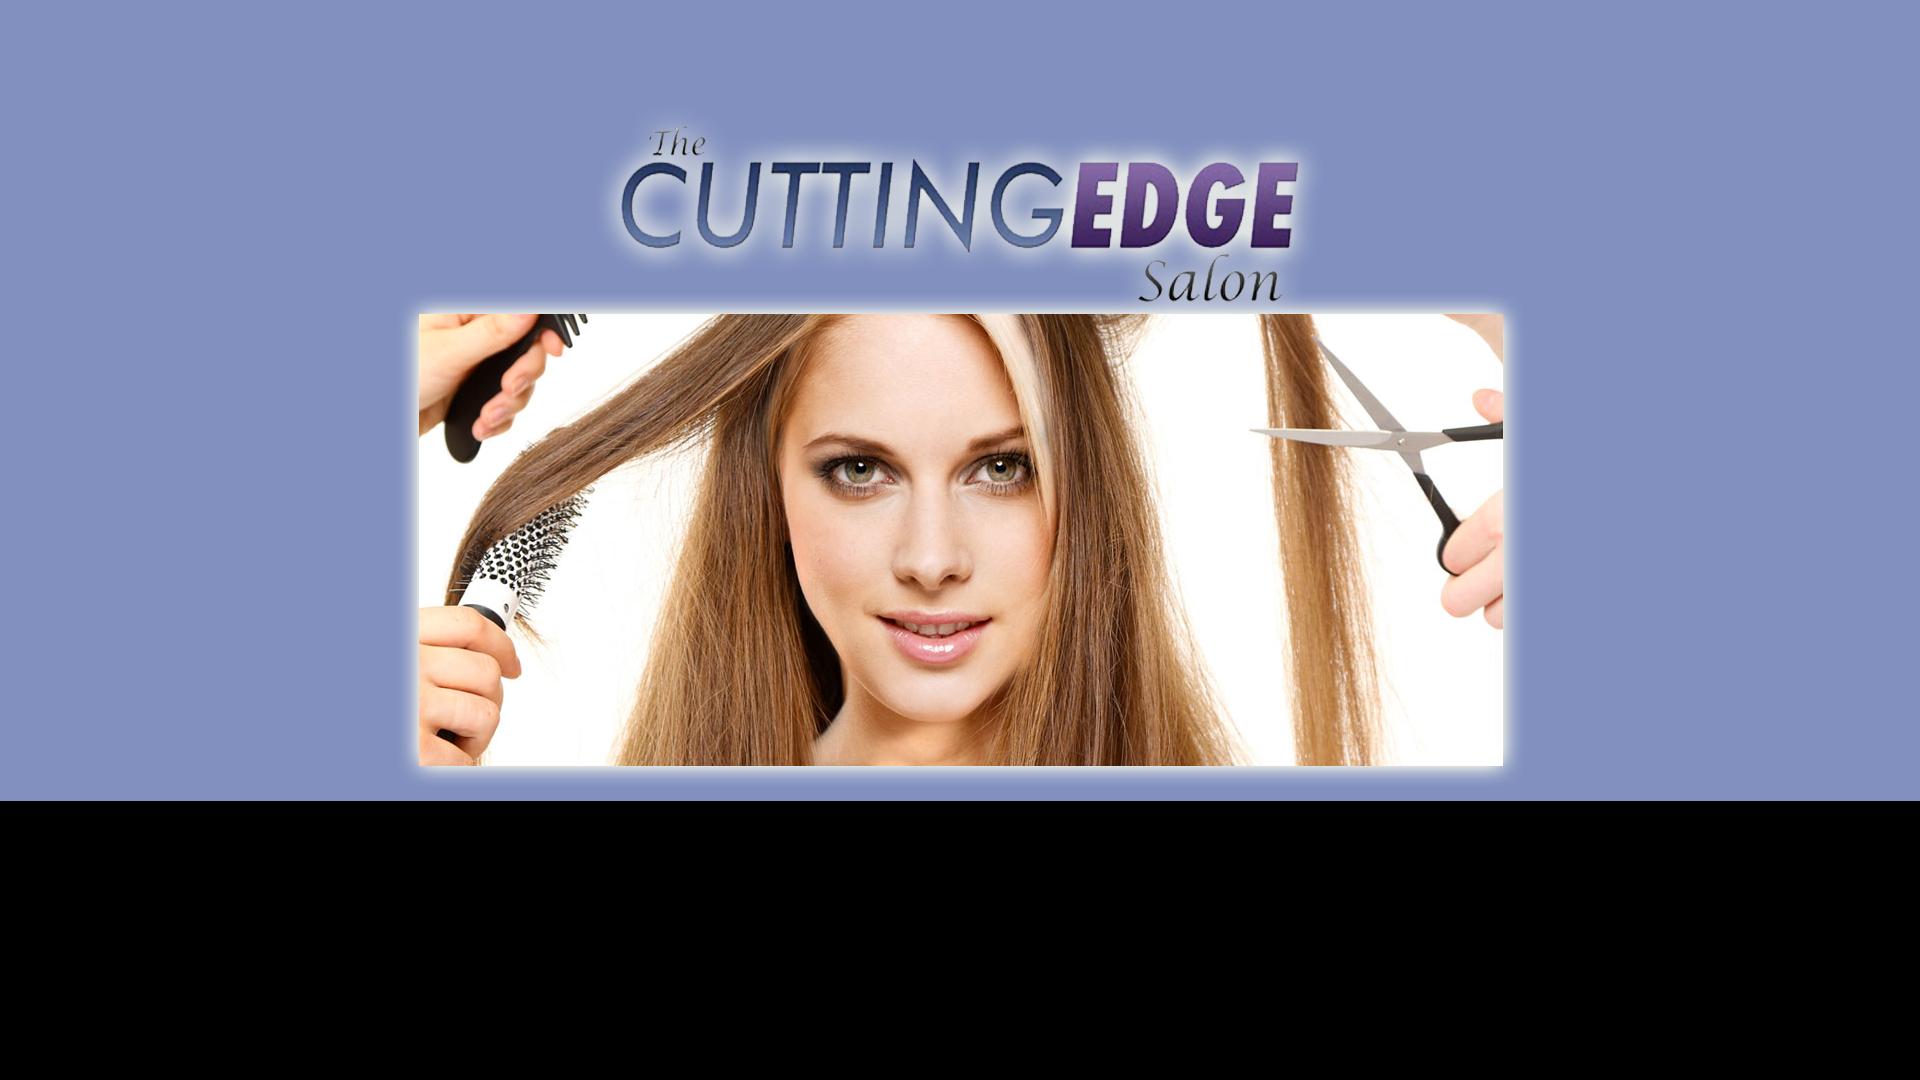 Utica NY 2 - $50 certificates, Cutting Edge Salon  $100 value